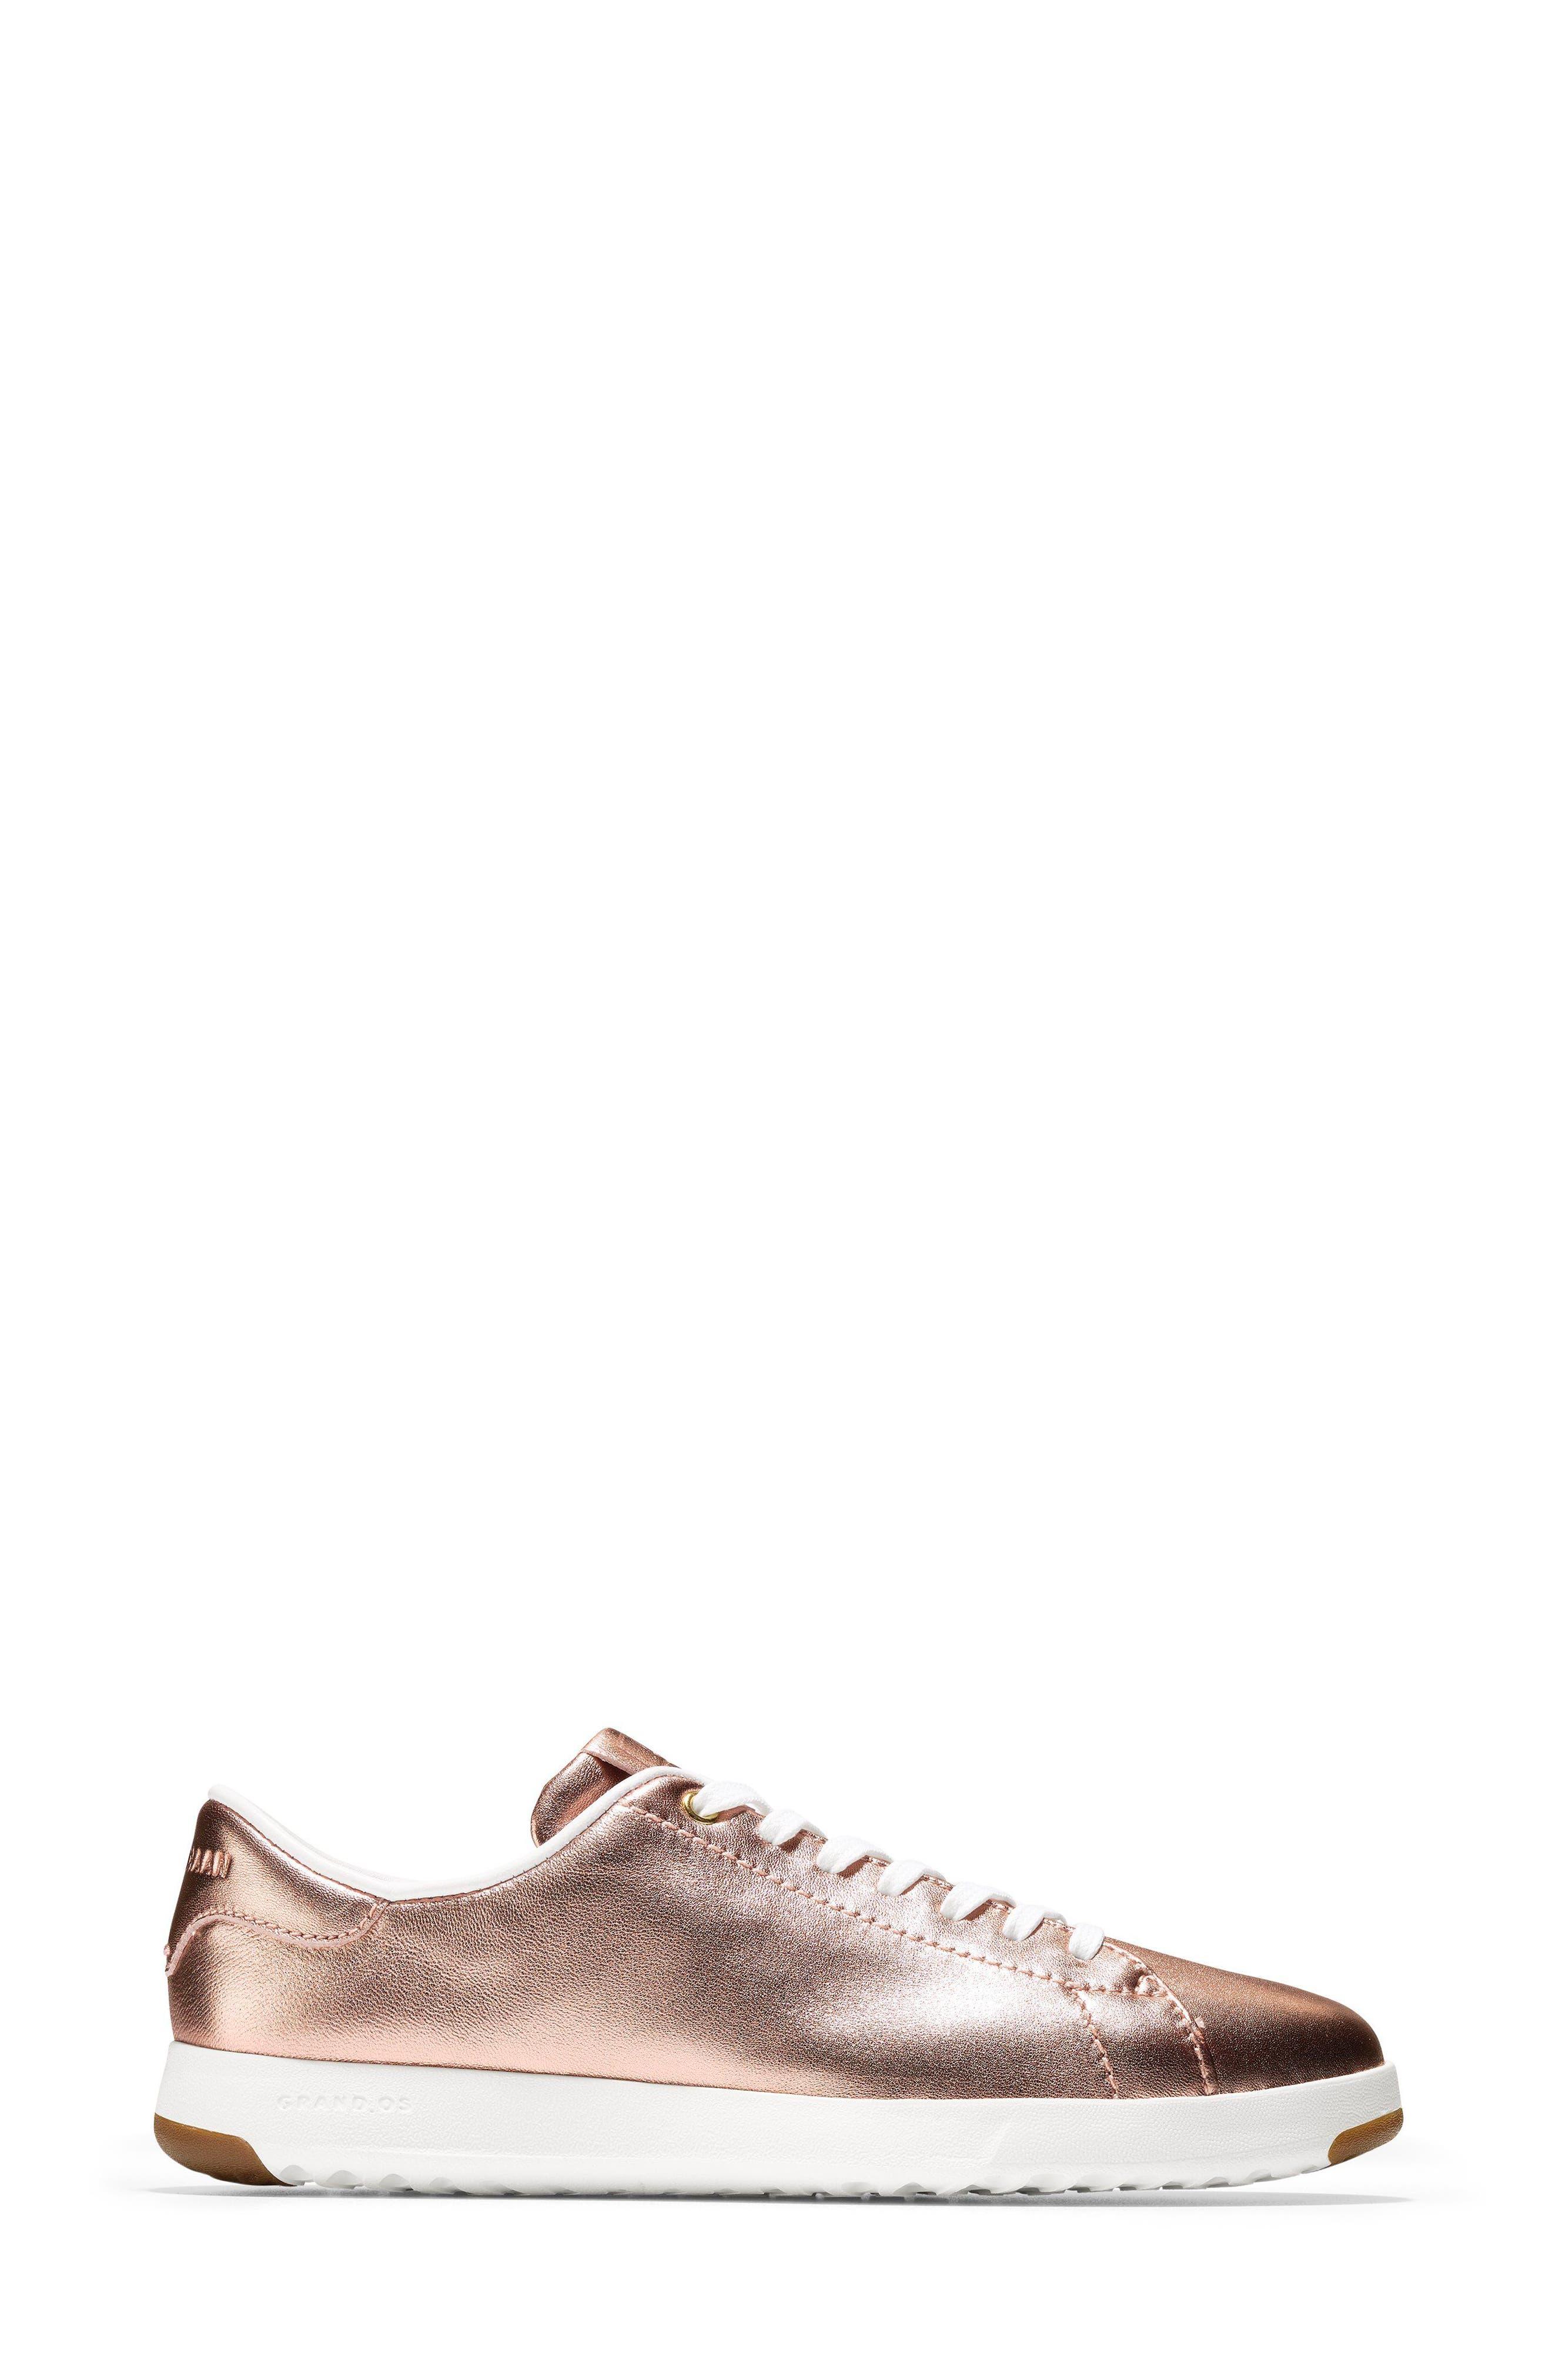 GrandPro Tennis Shoe,                             Alternate thumbnail 3, color,                             Rose Gold Leather